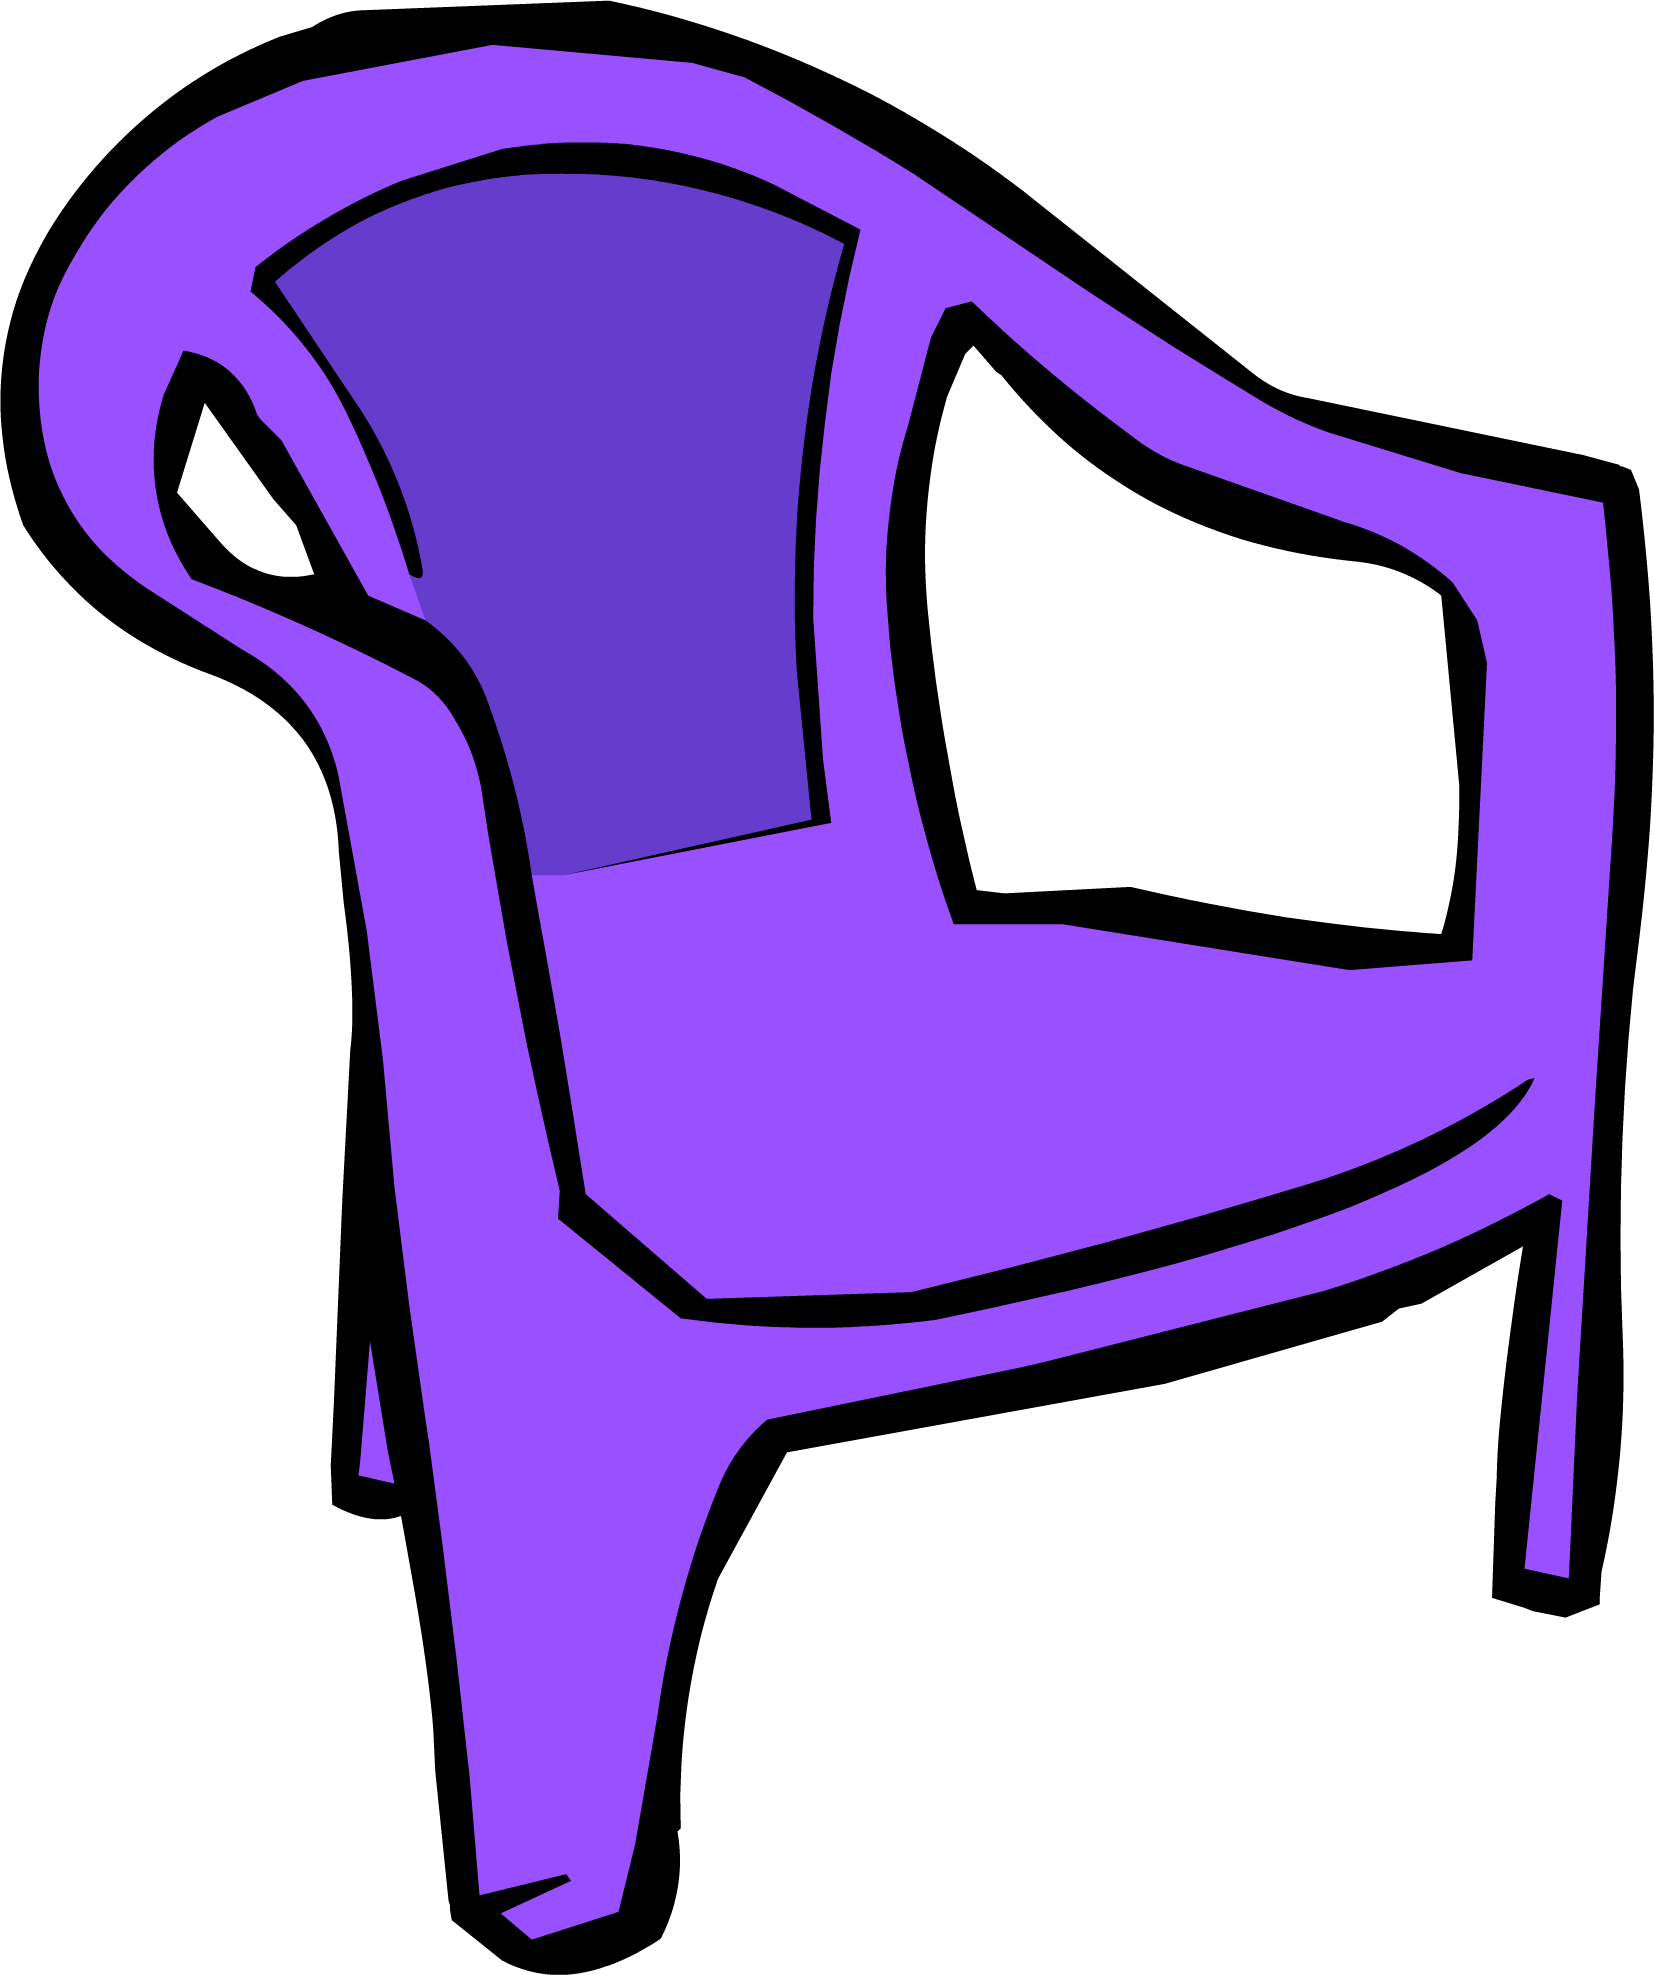 purple plastic chair information - Plastic Chair